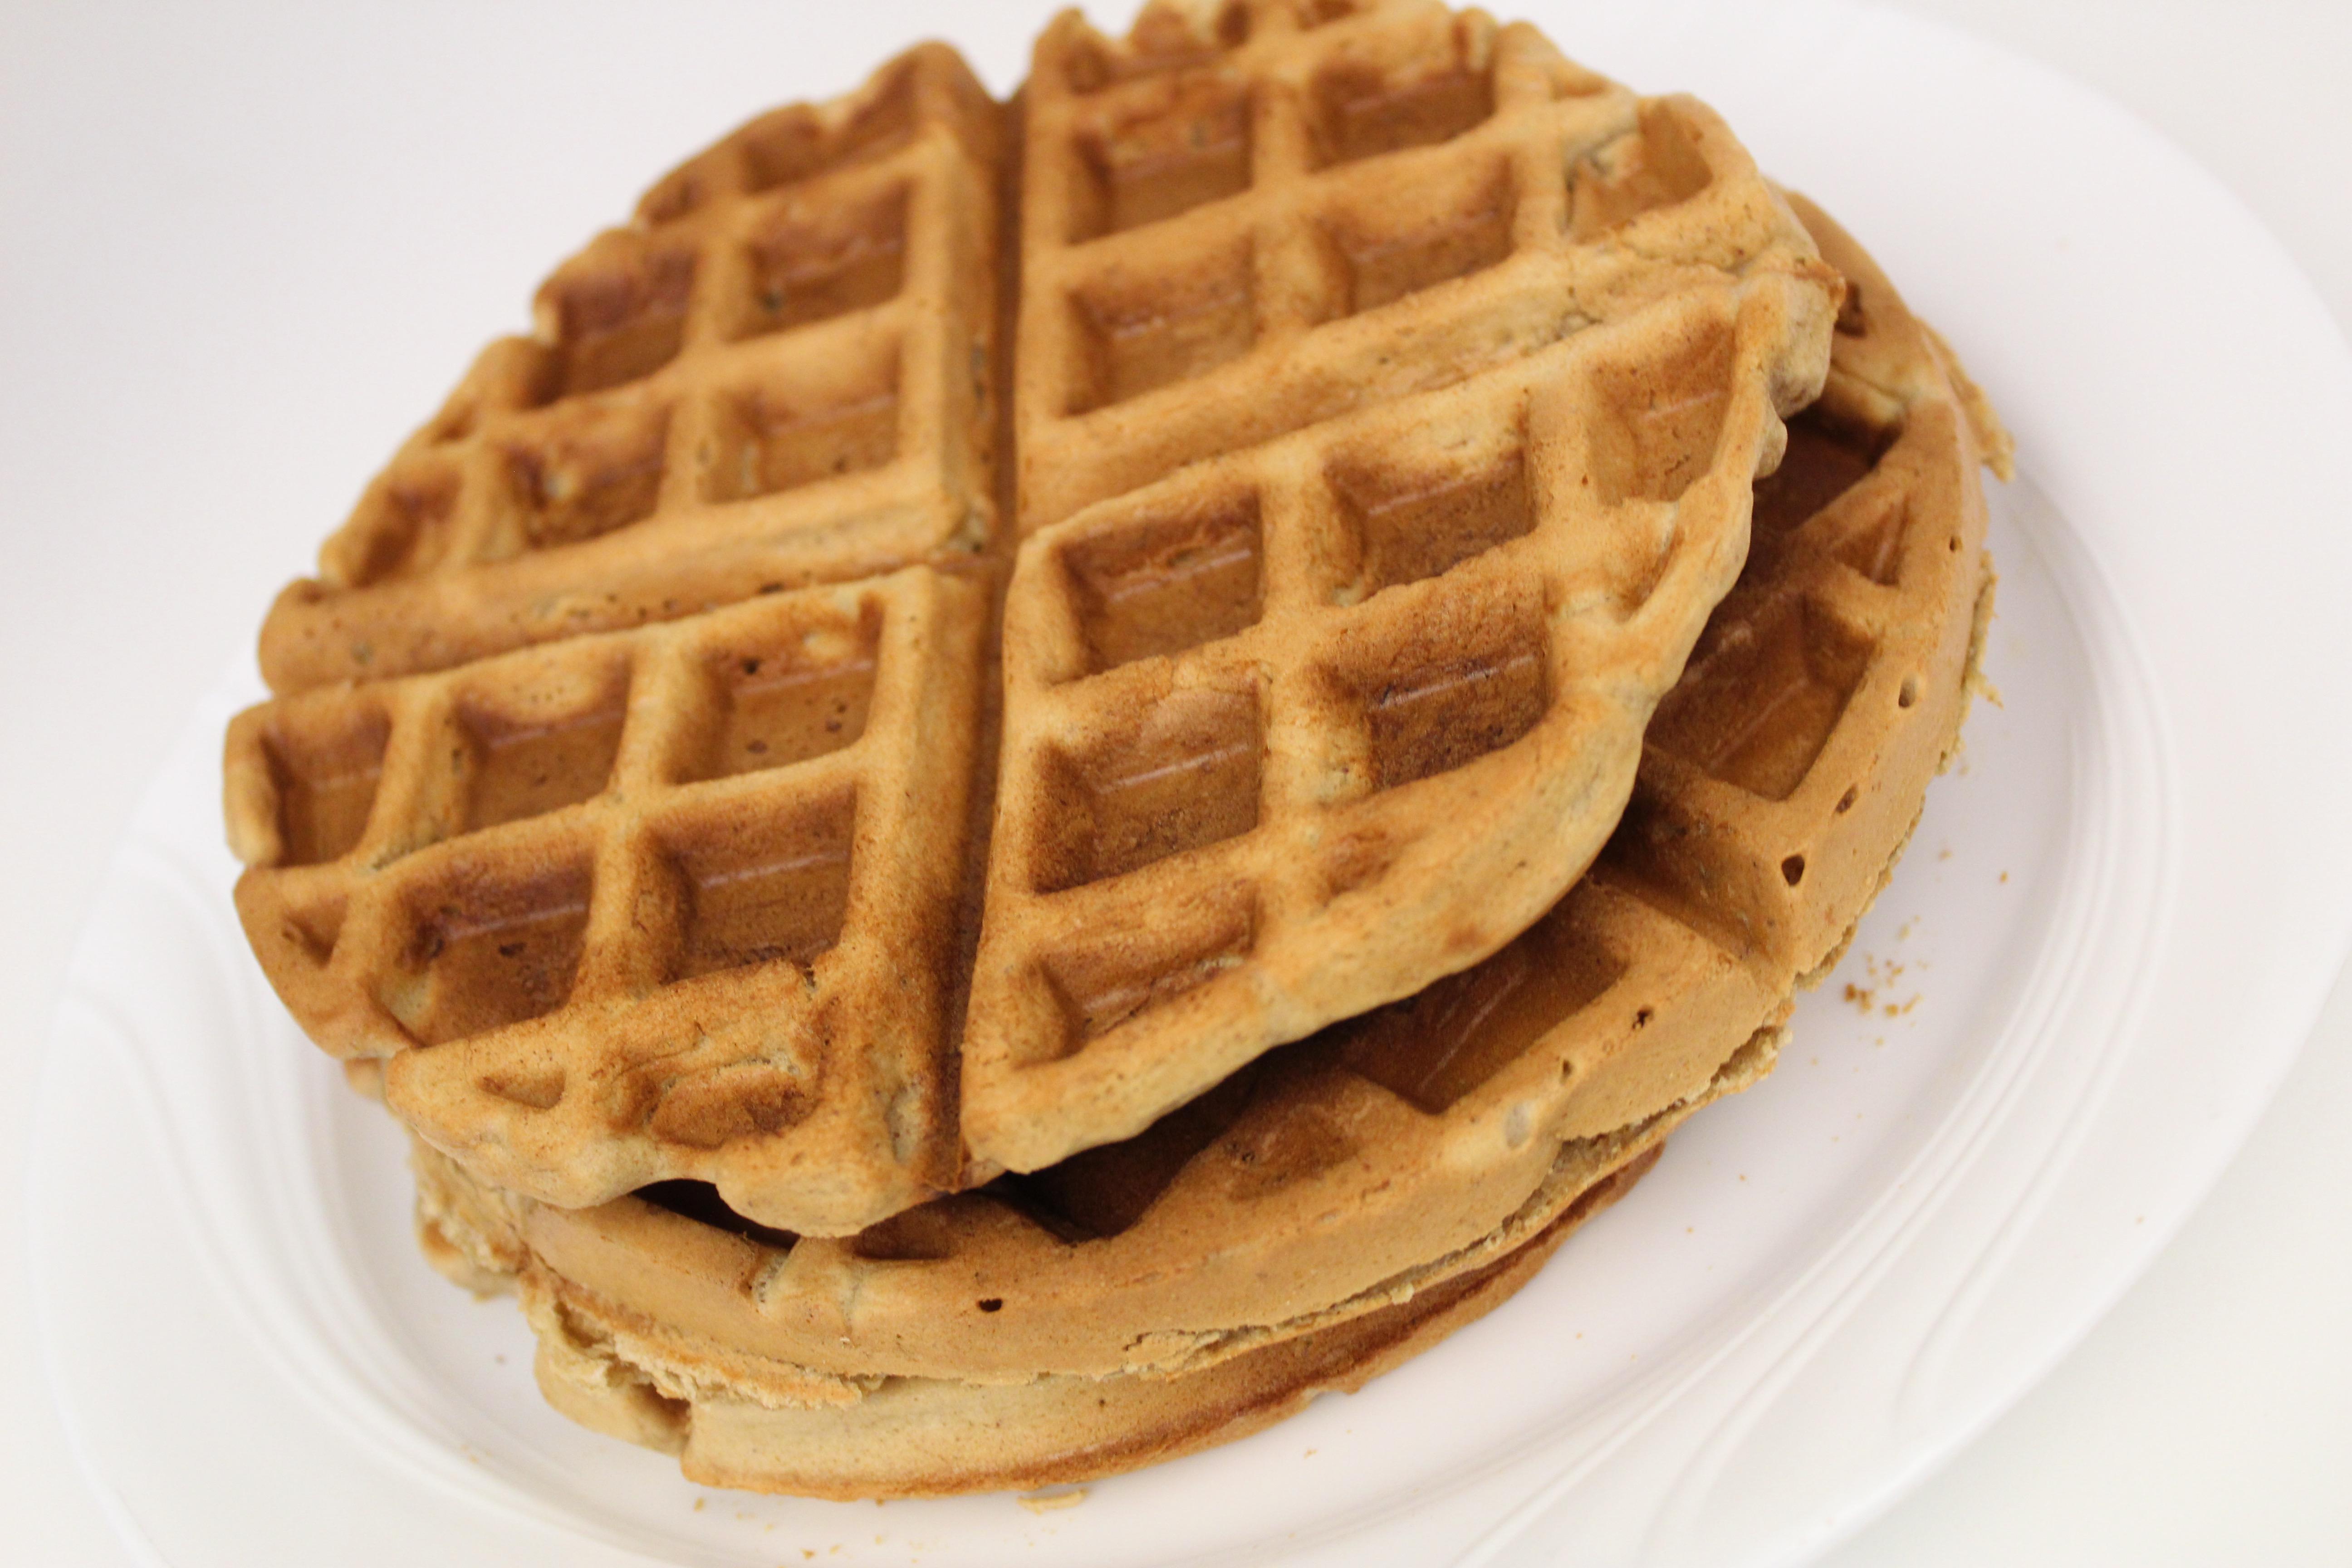 Vegan Banana Waffles